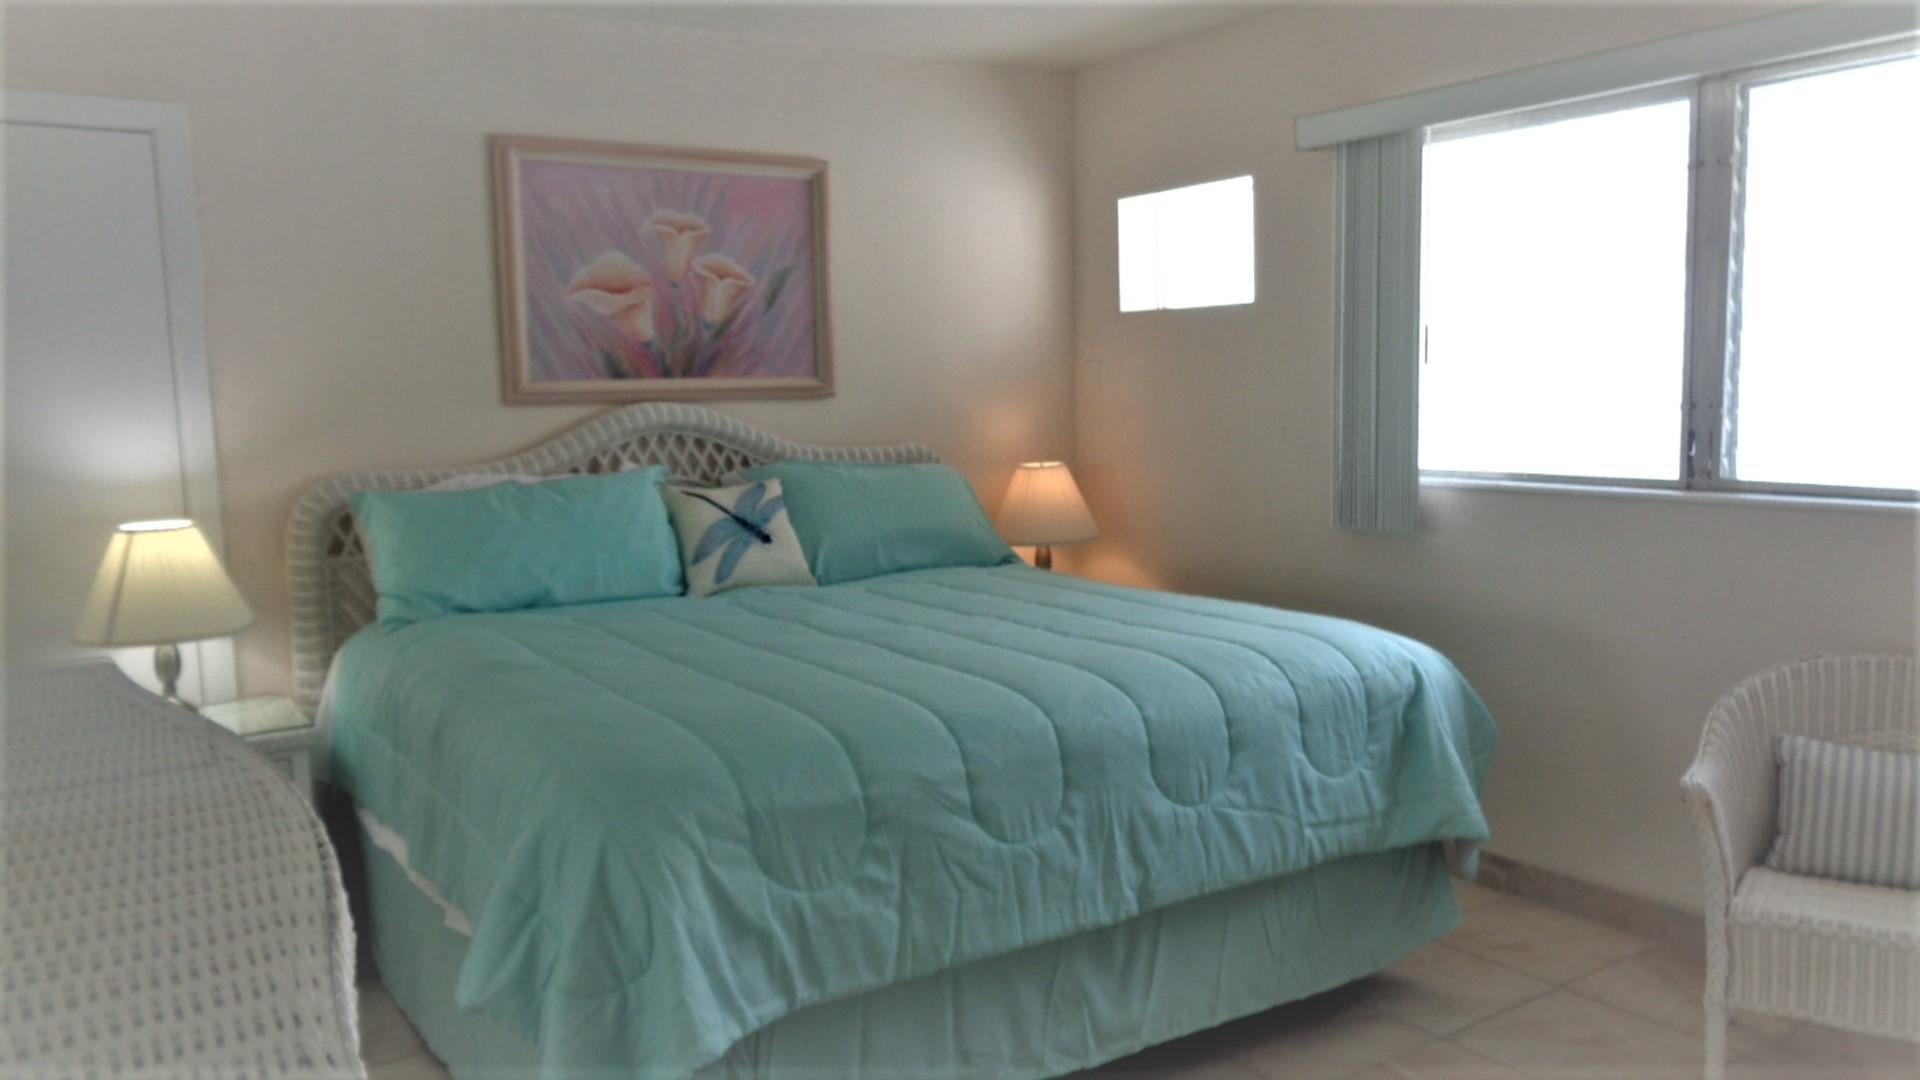 Unit 10 Bedroom